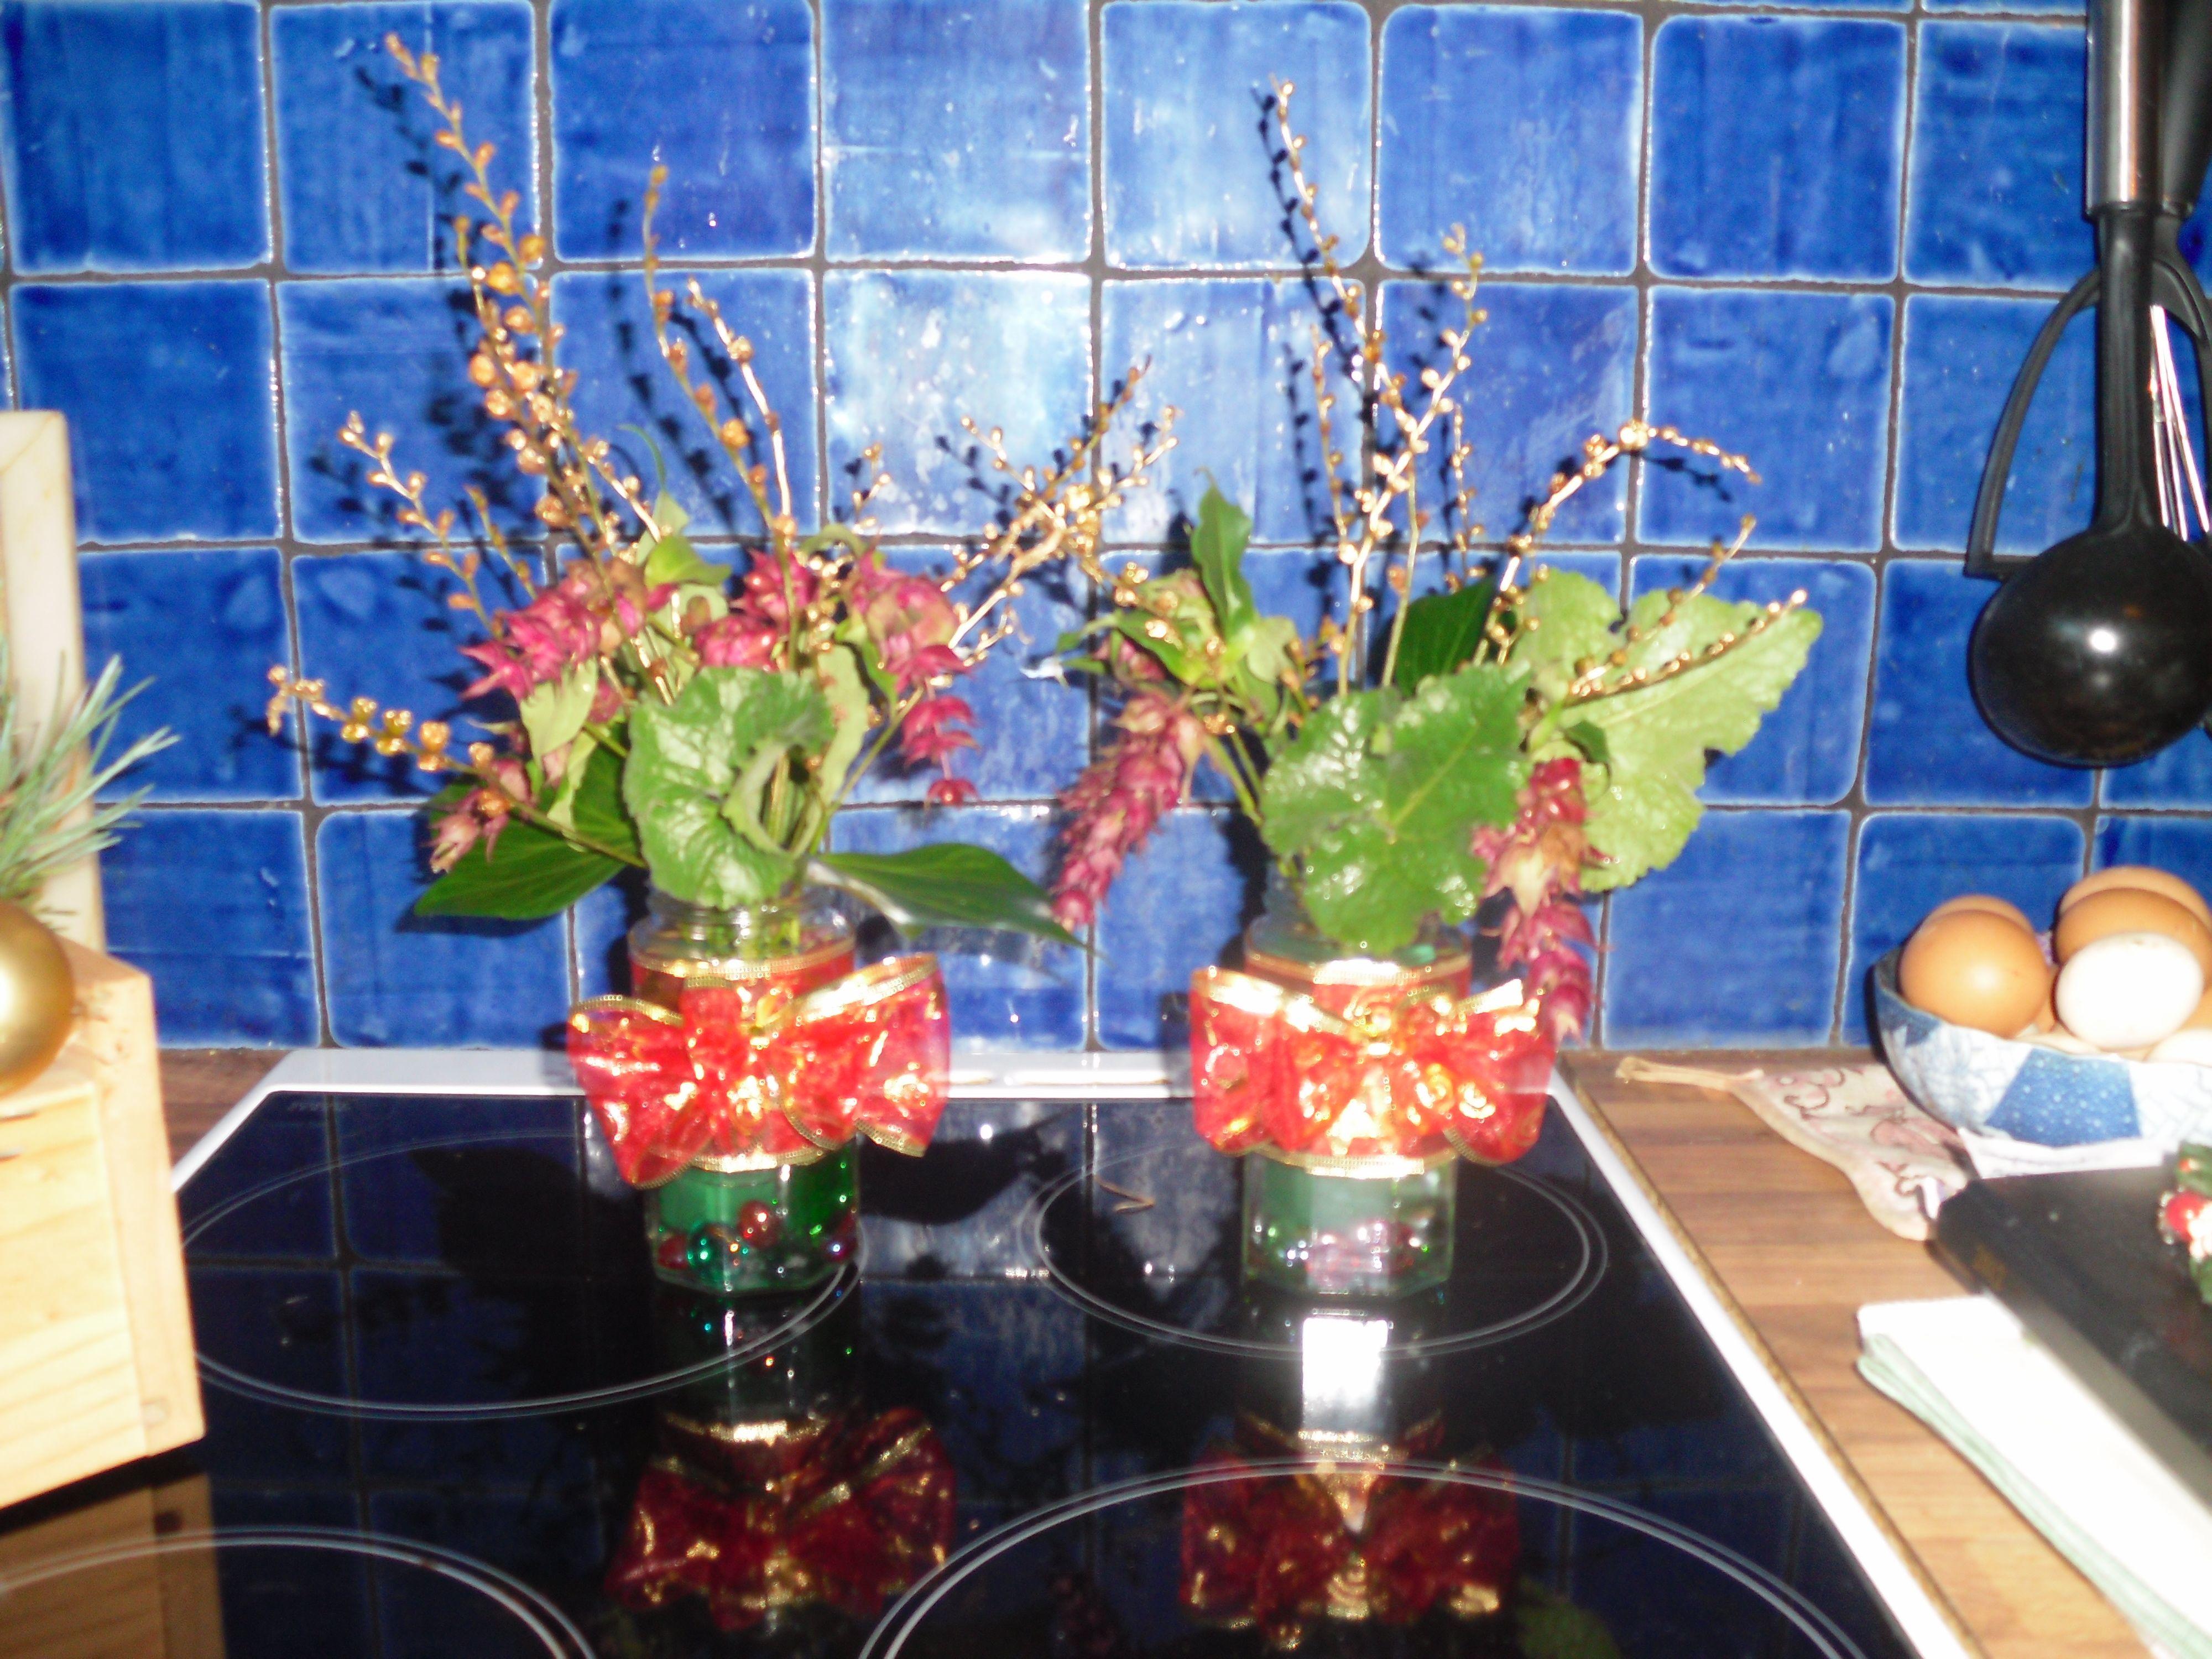 DIY Xmas Display. Fancy jars/bows/winter garden flowers and foliage